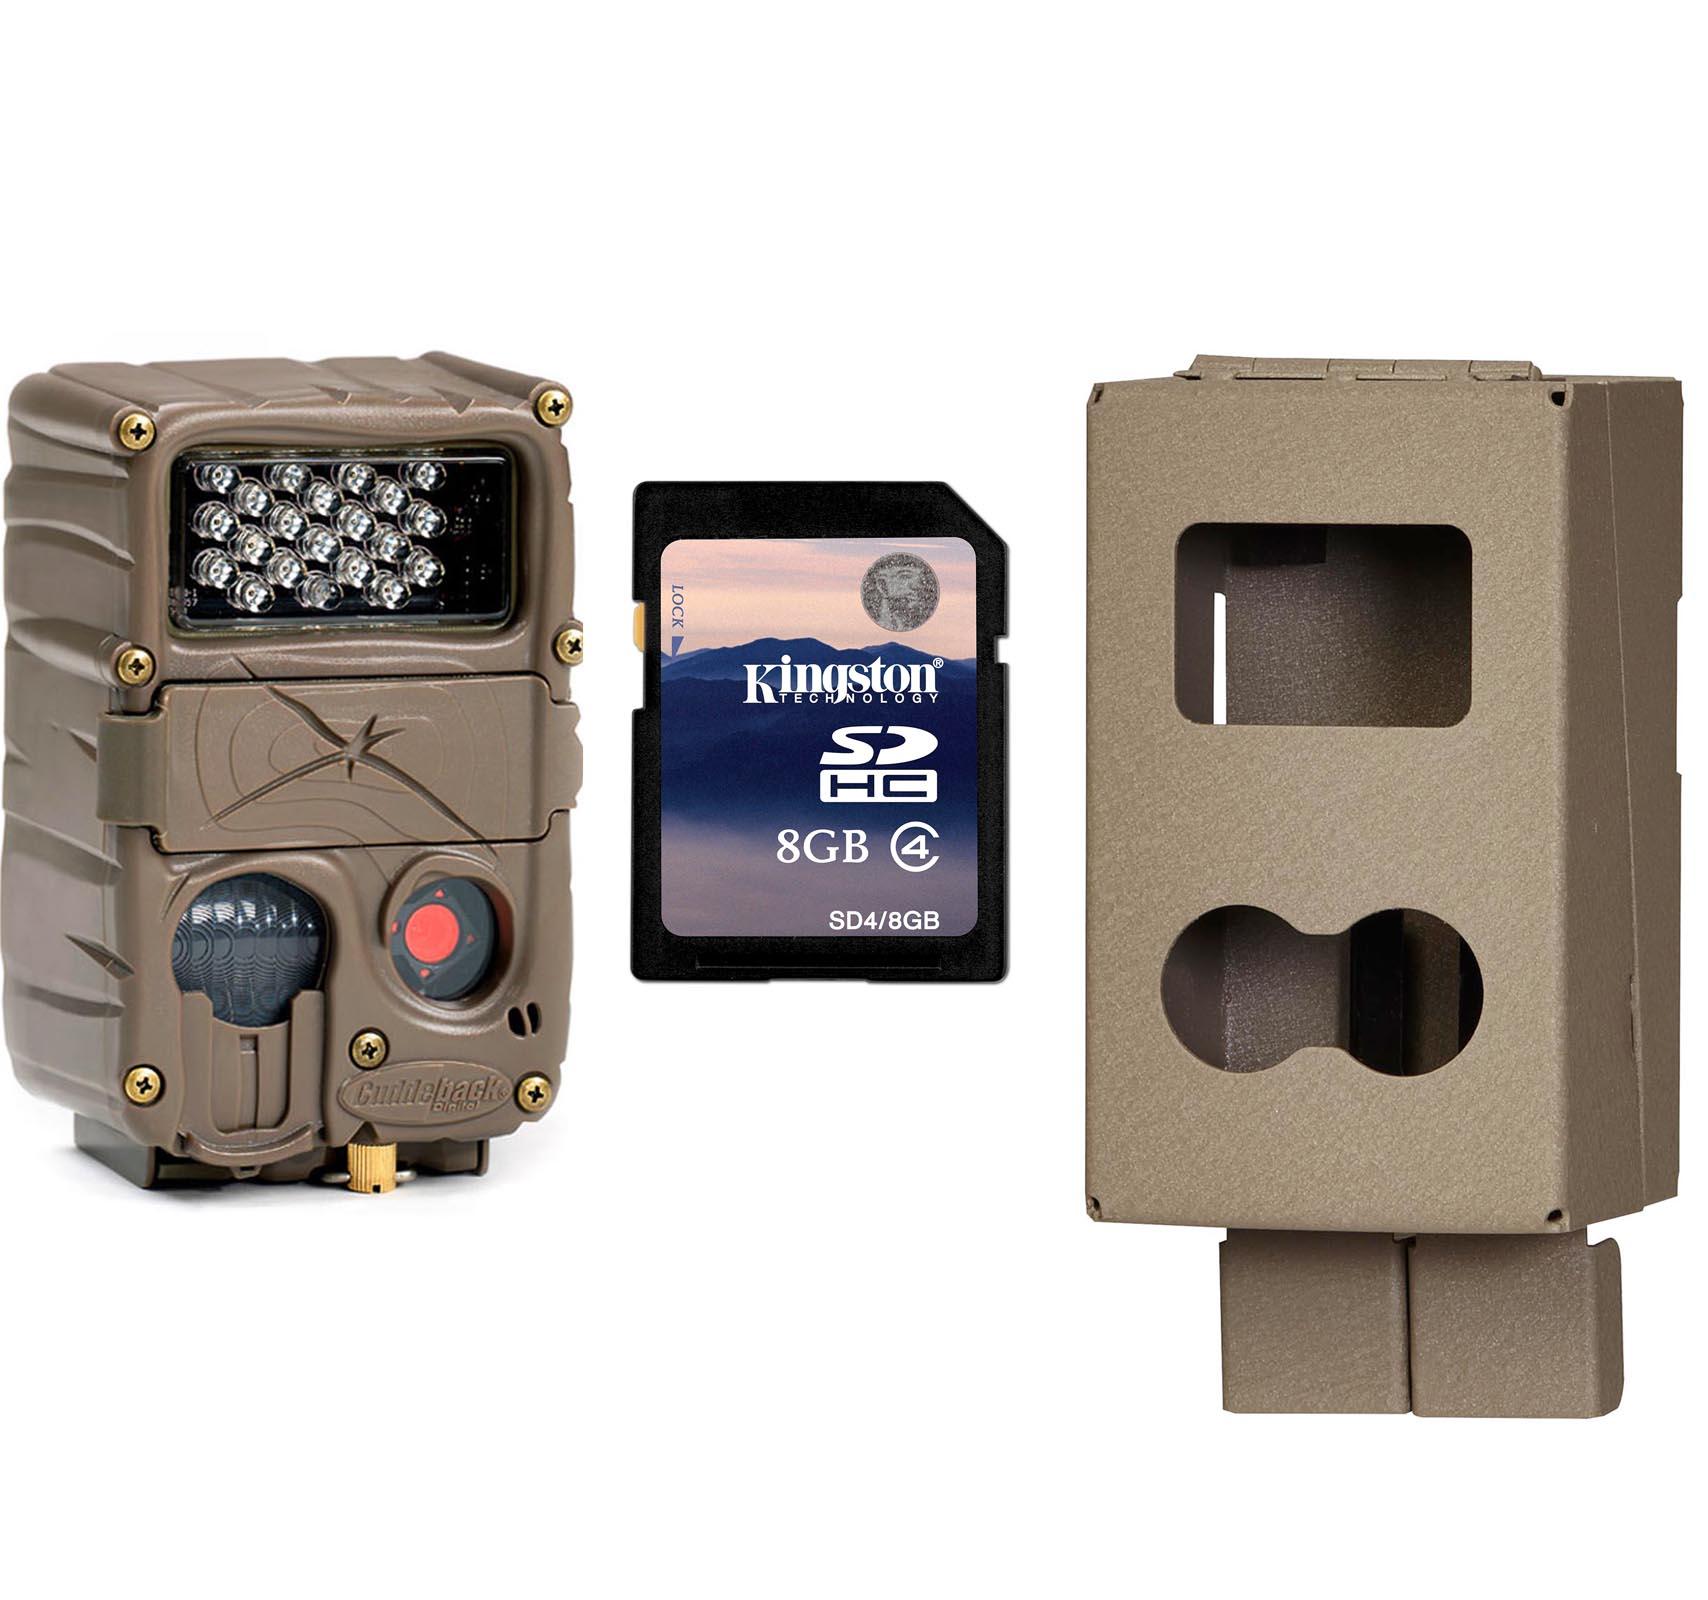 CUDDEBACK Model E2 Long Range IR Micro 20MP Game Hunting Camera w/Case & SD Card